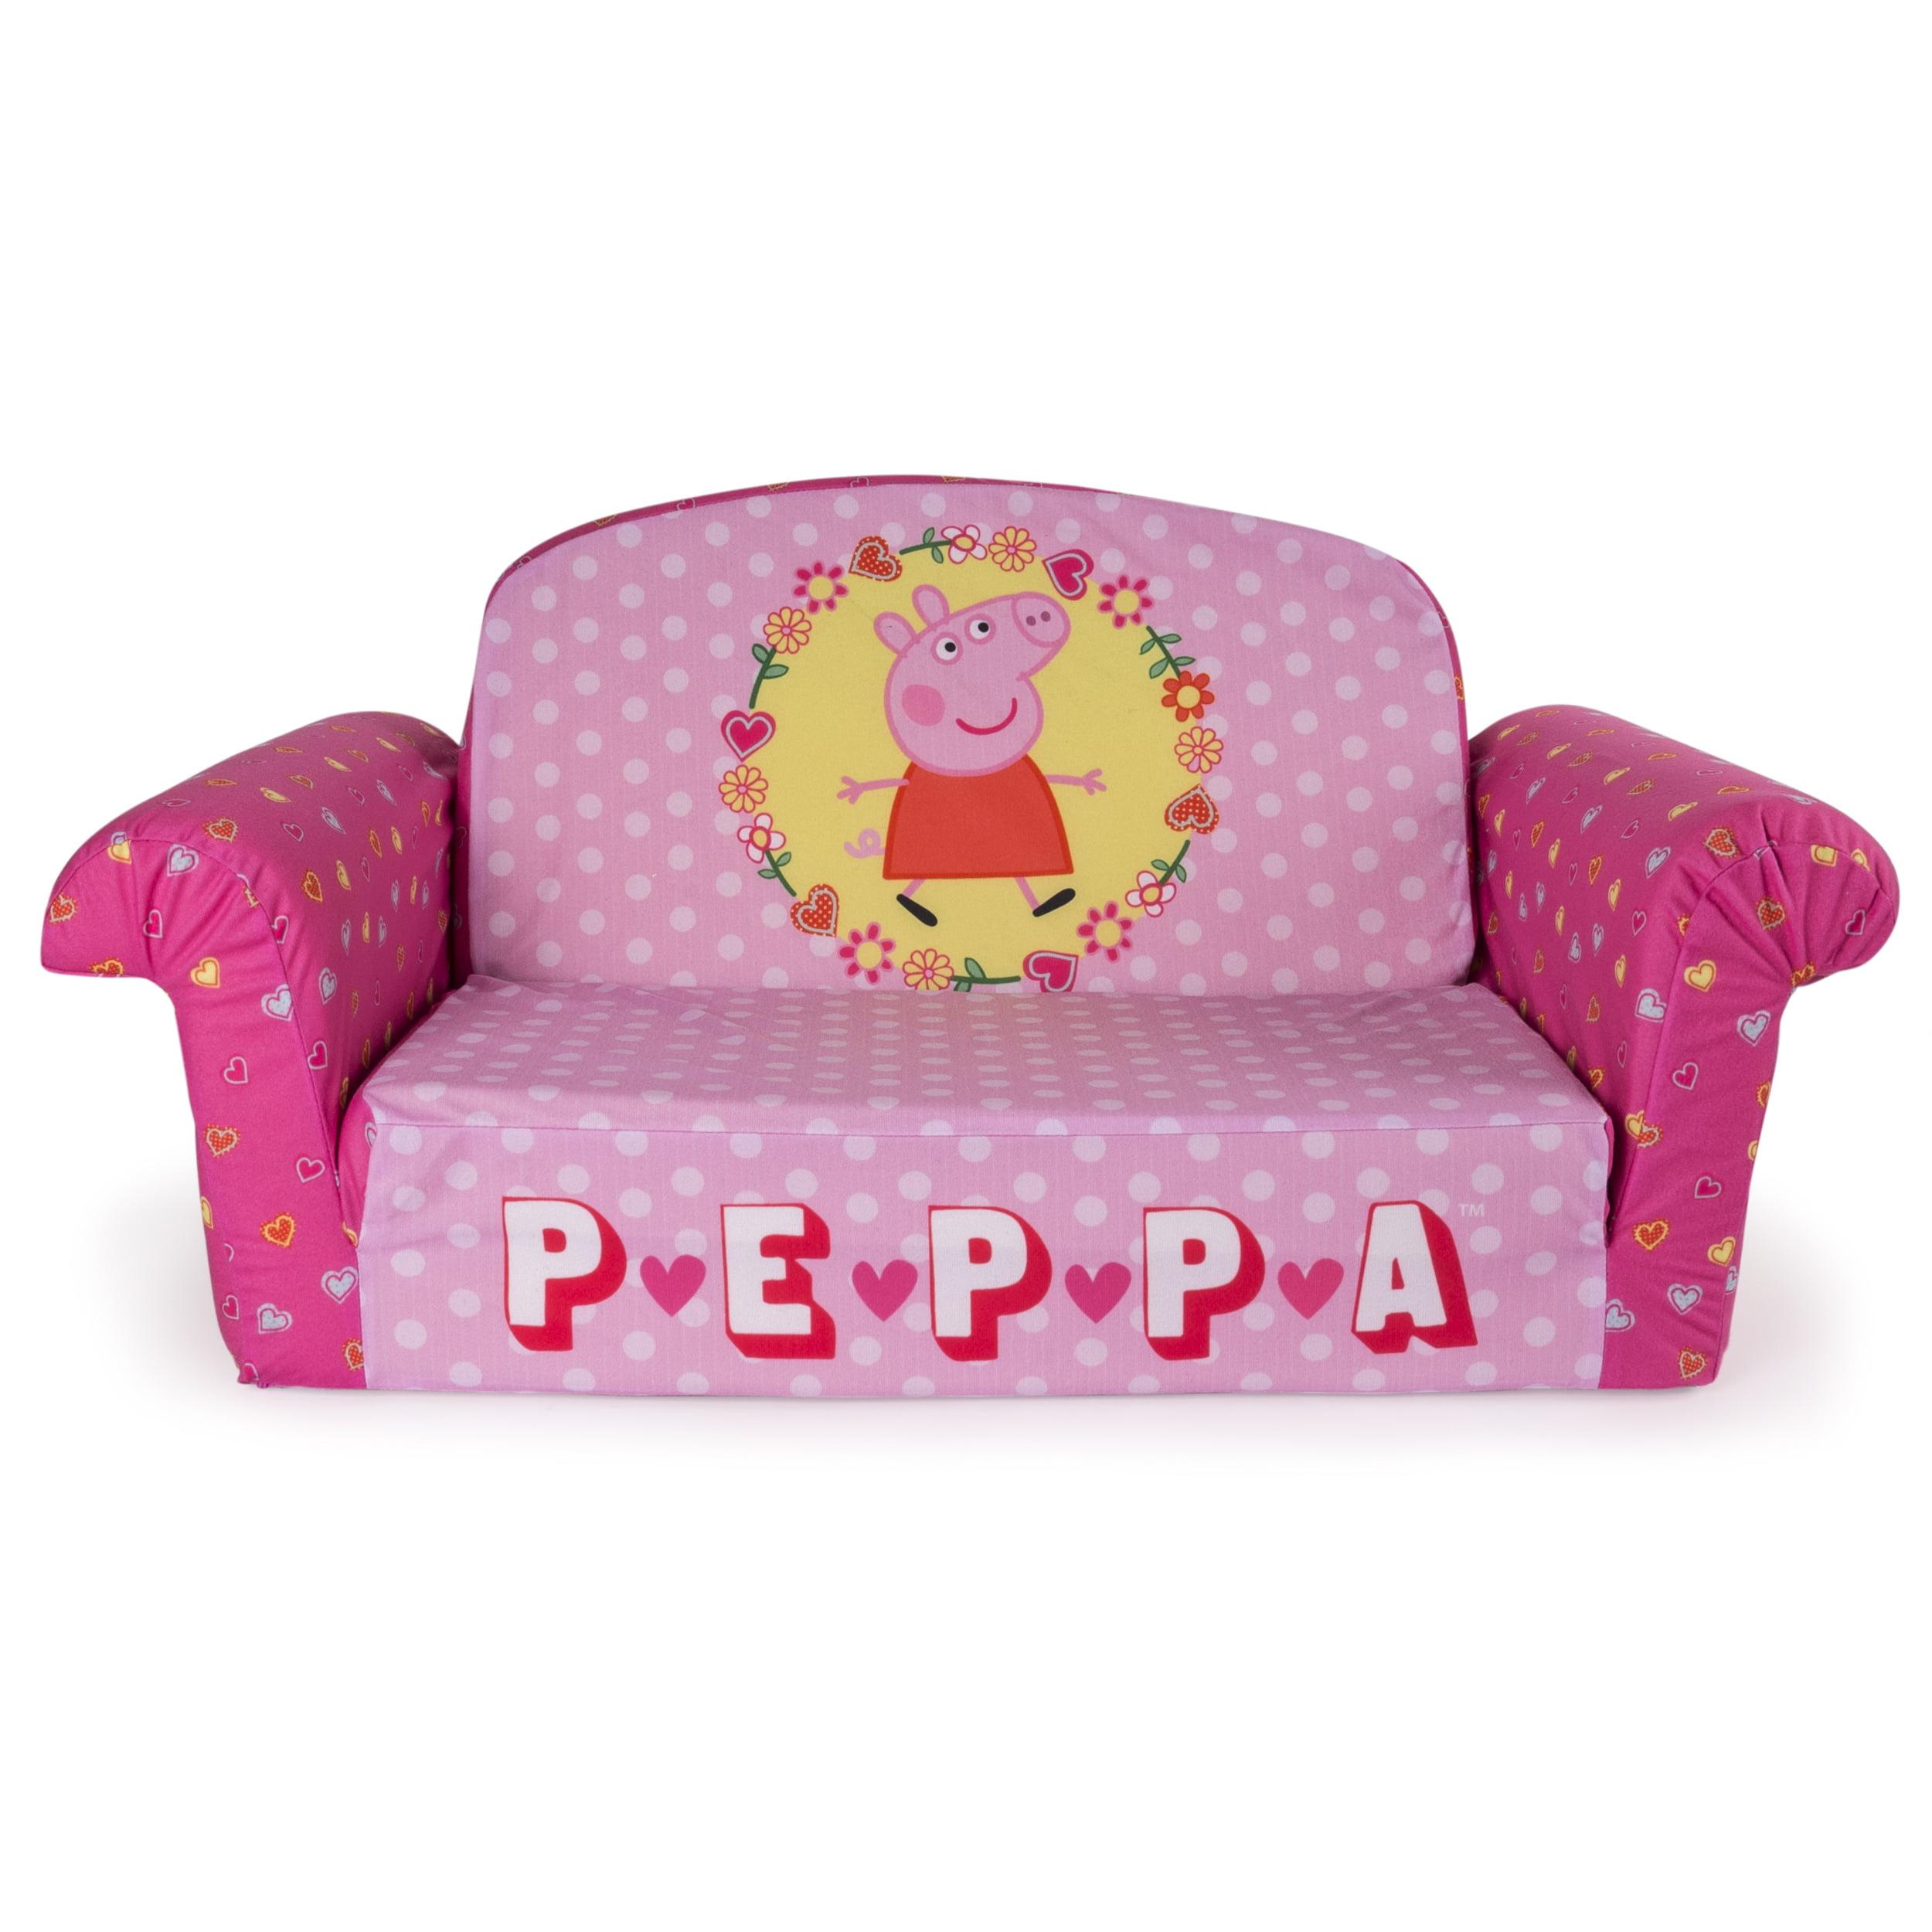 Peppa Pig Bedroom Furniture Marshmallow Furniture Flip Open Sofa Peppa Pig Walmartcom